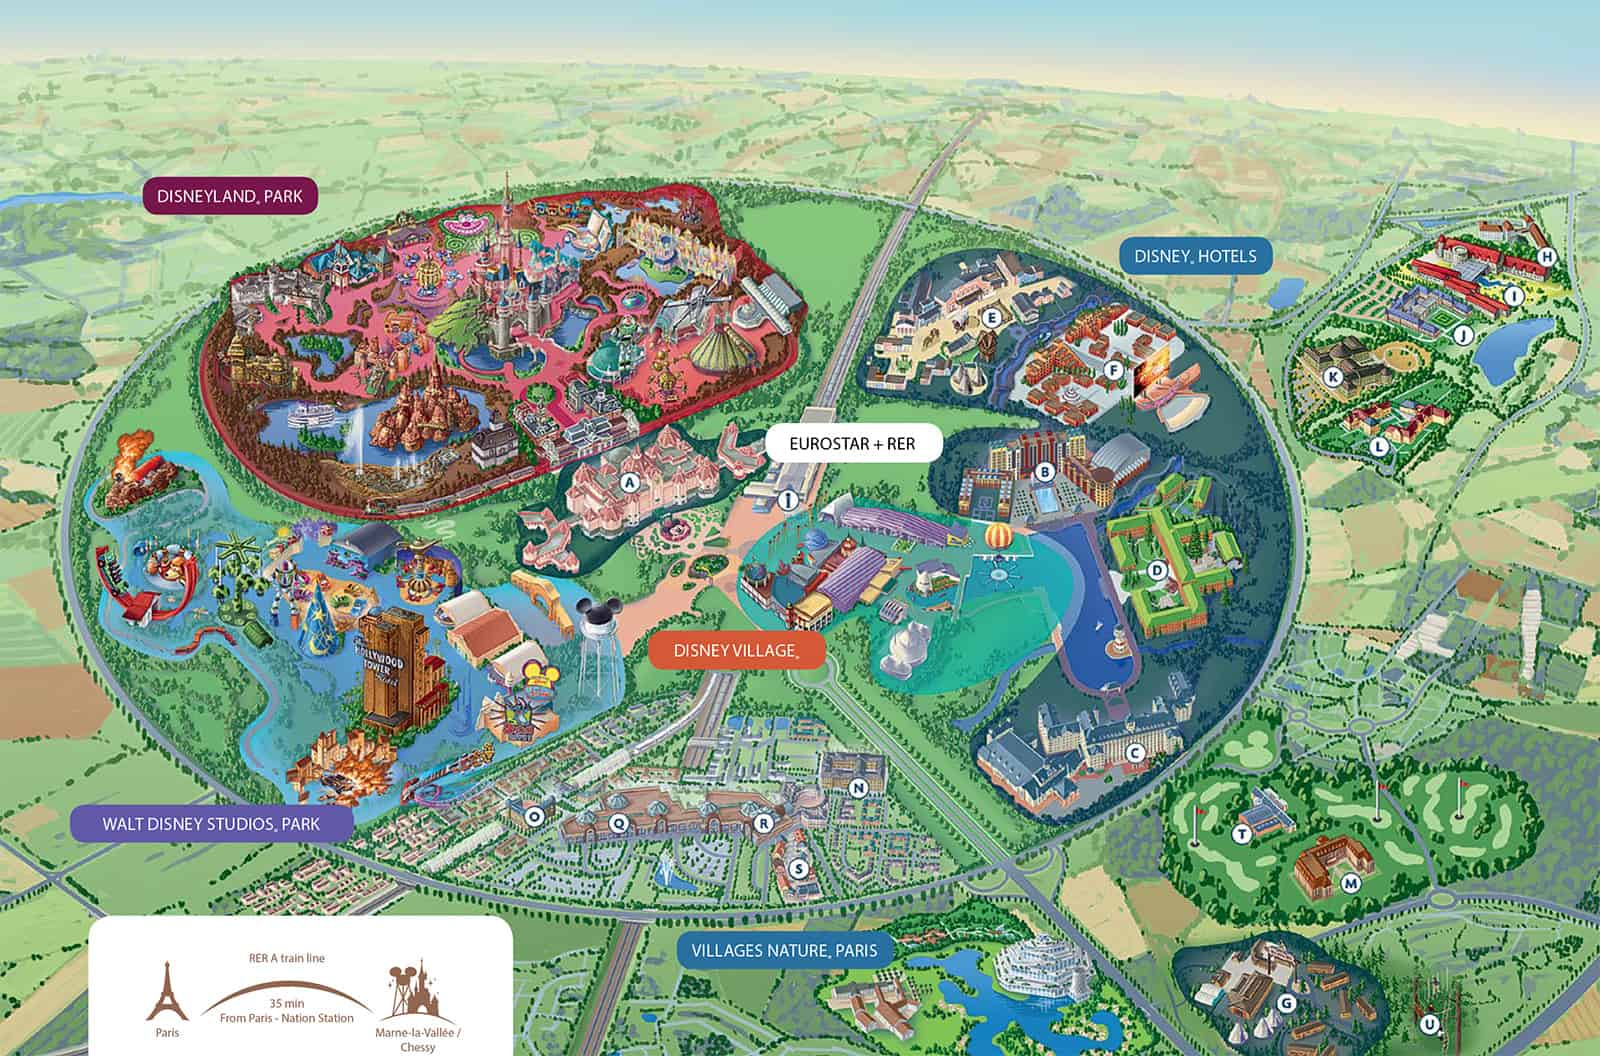 Disneyland στο Παρίσι Χάρτης